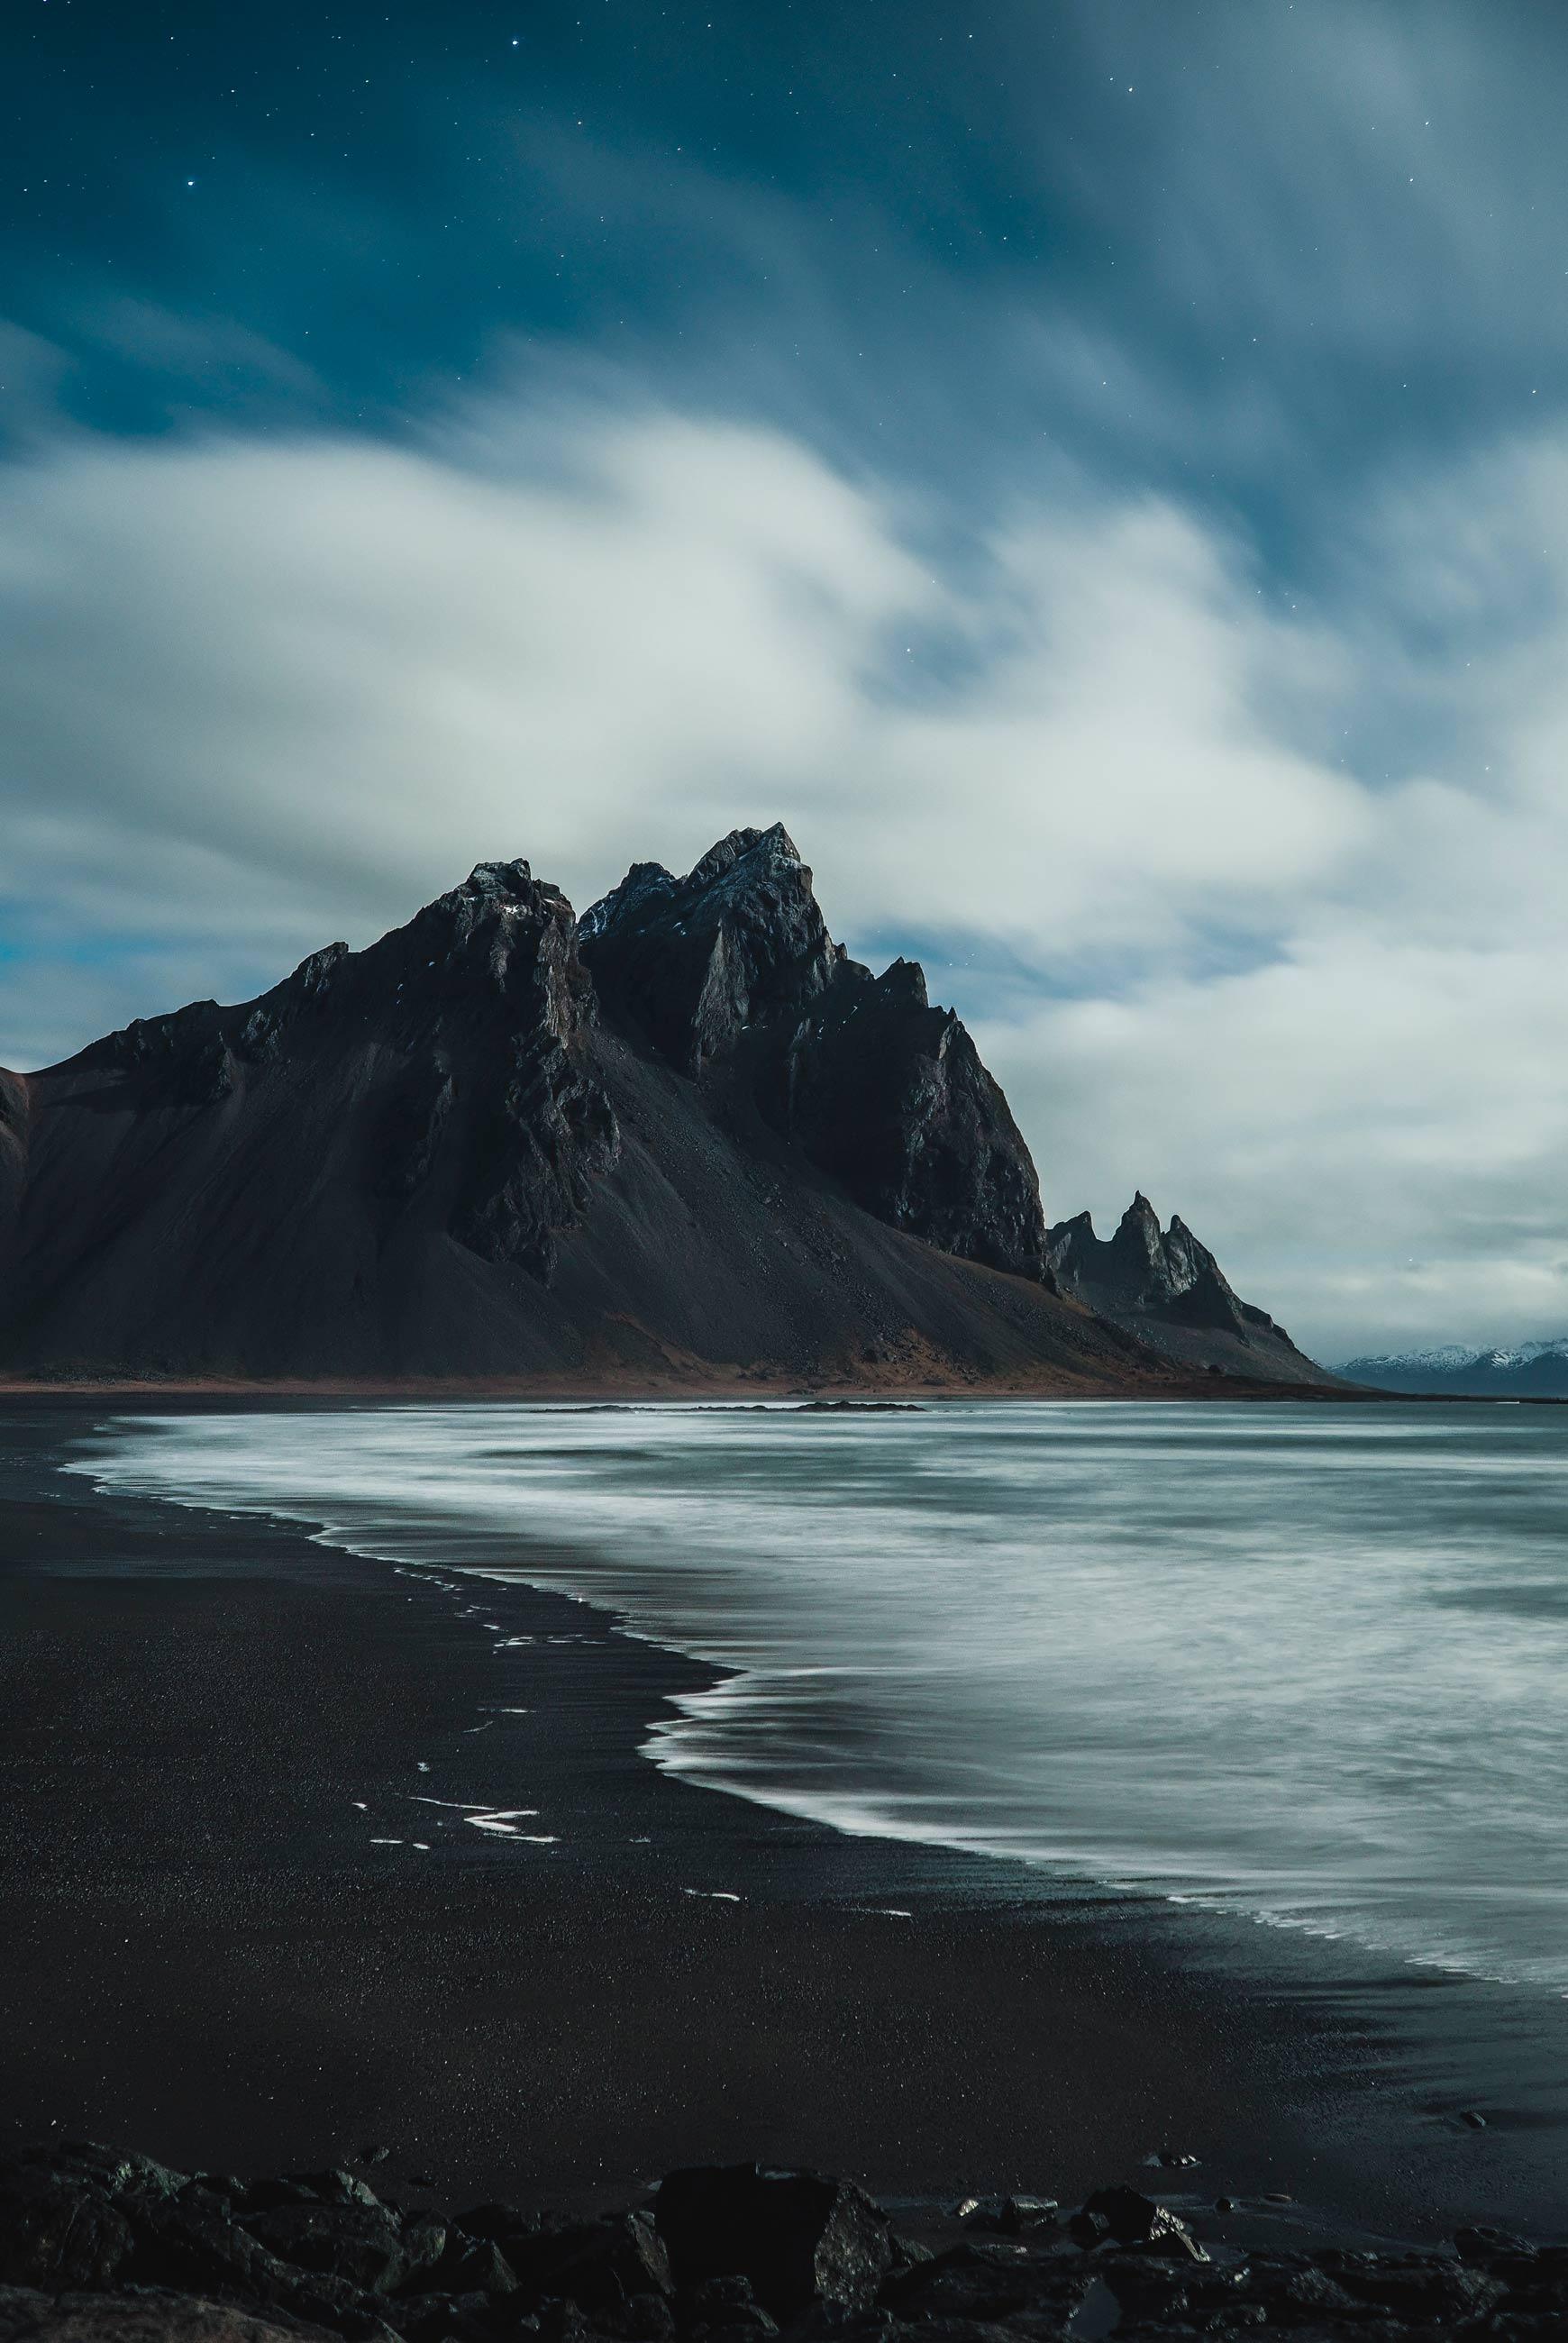 Island Küste Vulkan Benjamin Hardman